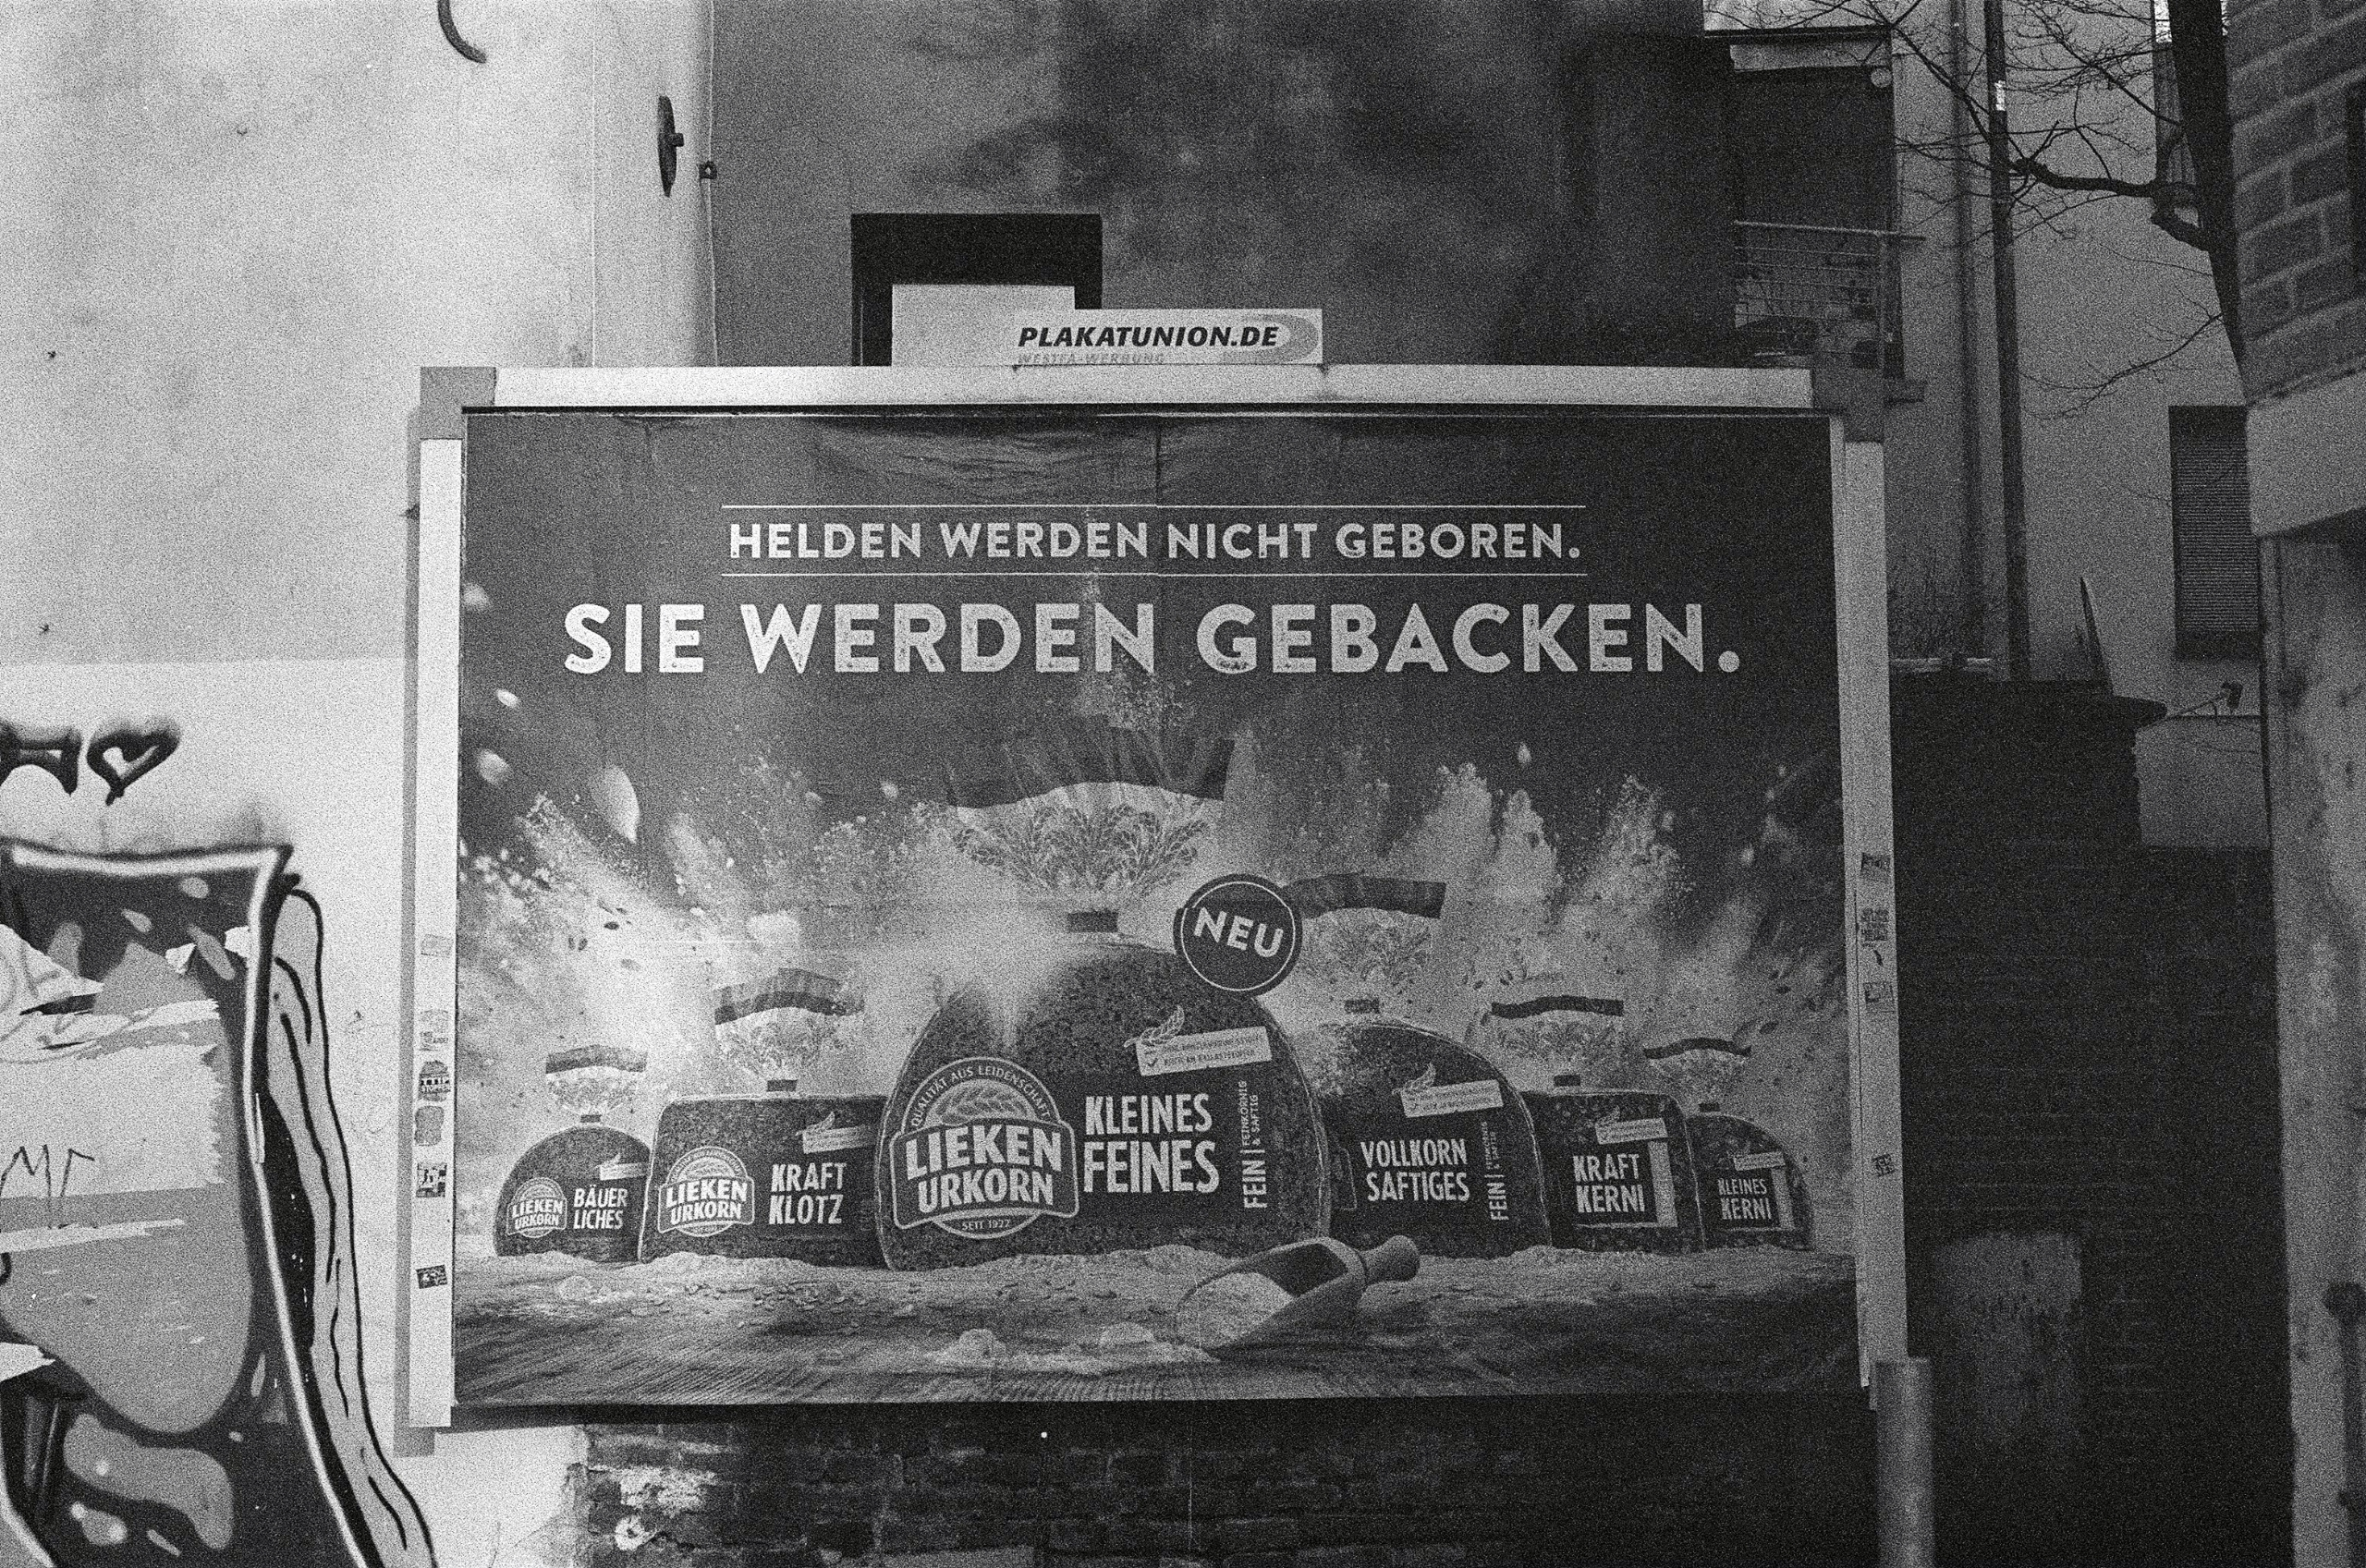 Helden Camera: PENTAX smc 1:1.7 - walter_ac   ello